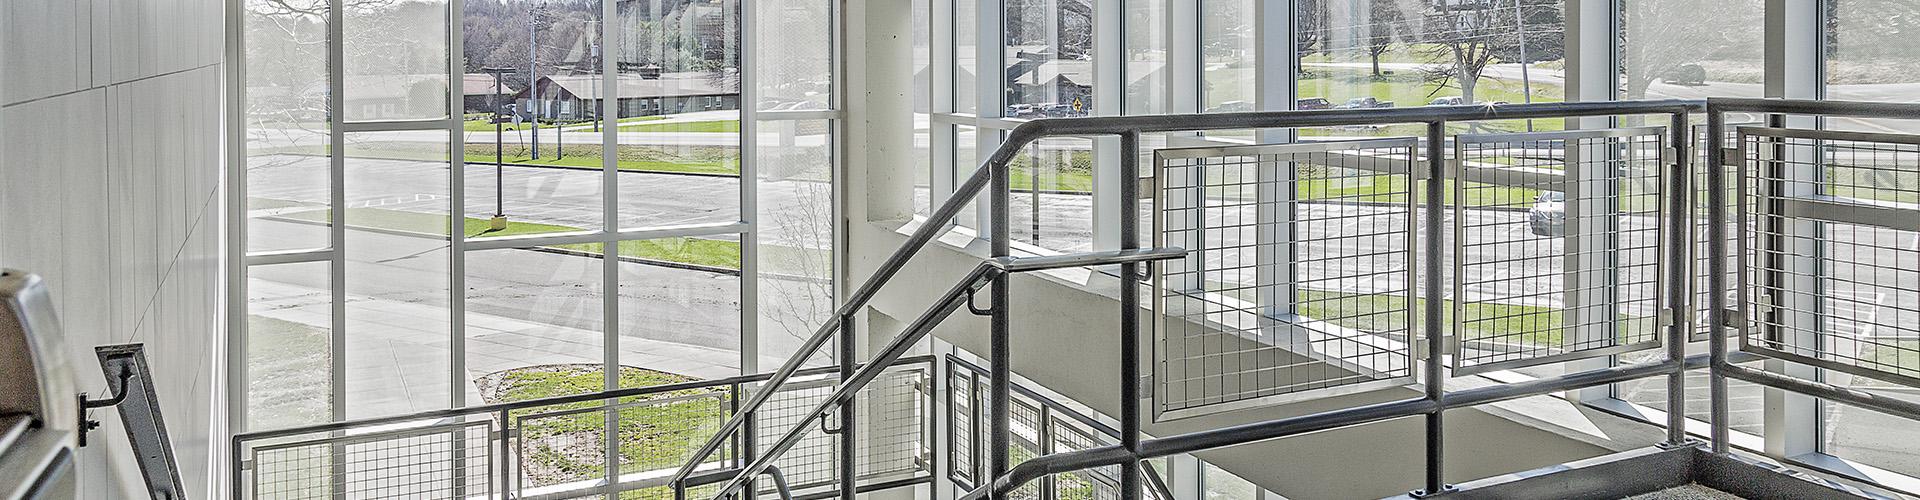 MCK Building Associates Westhill CSD Stairway